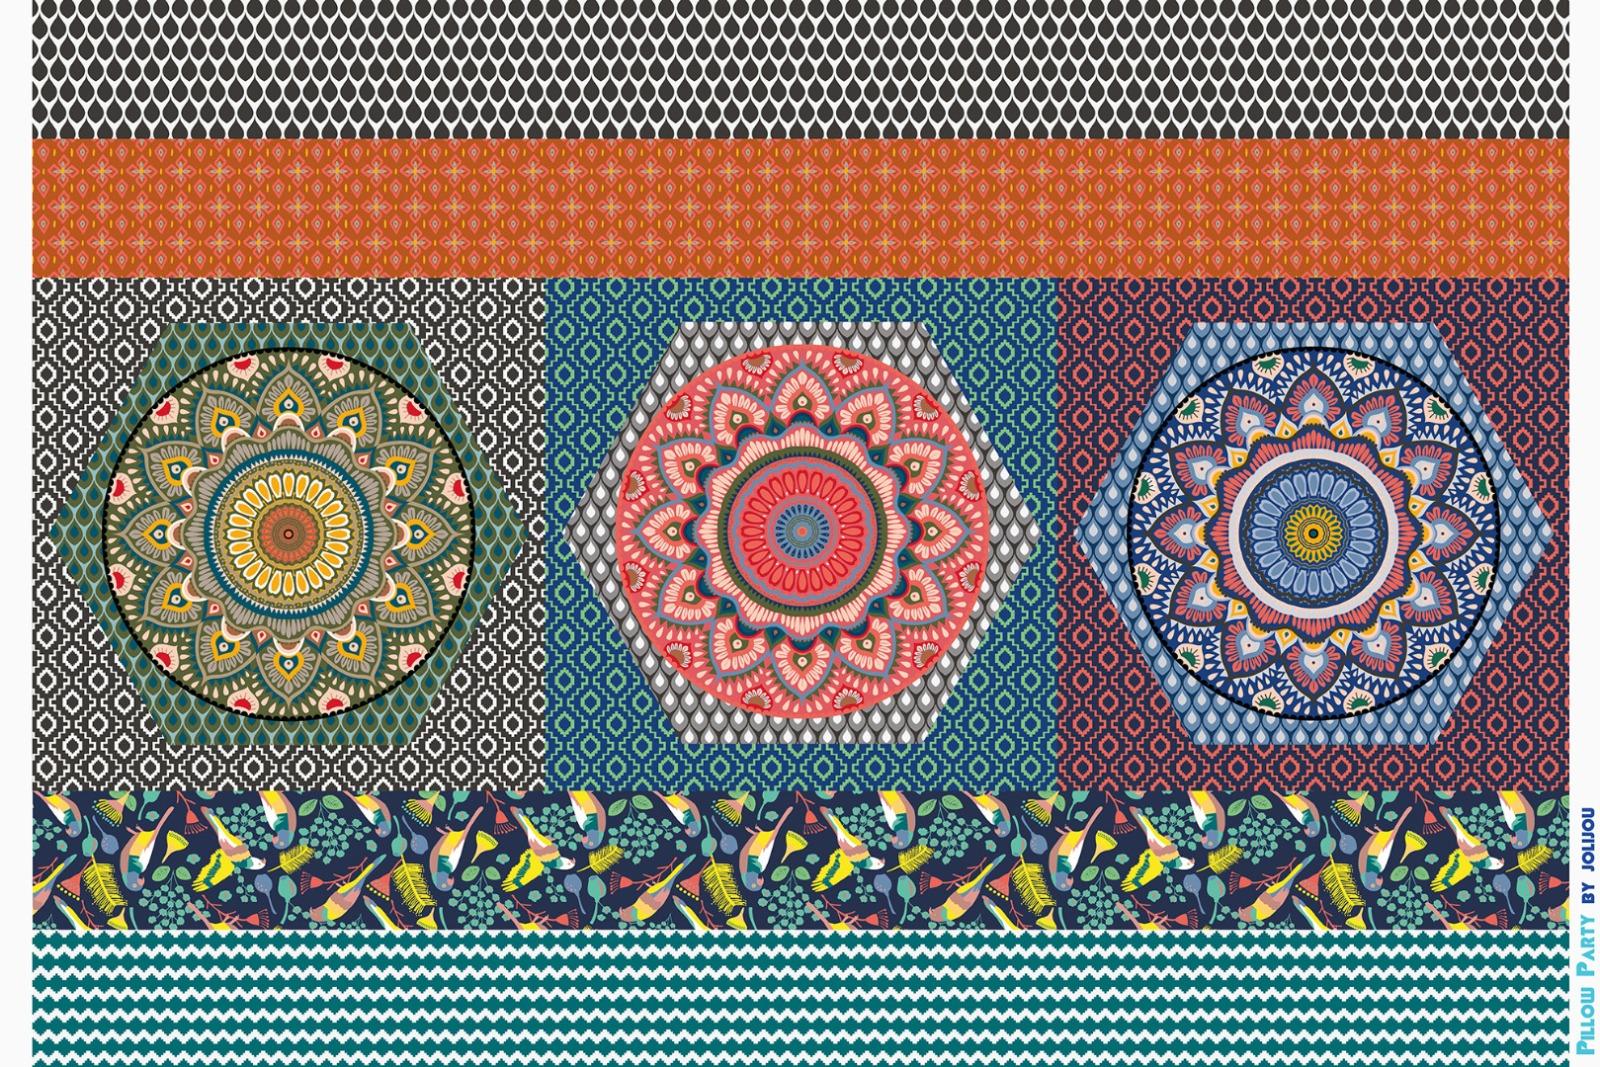 Pillow Party von Swafing by jolijou neue Farbe - 1